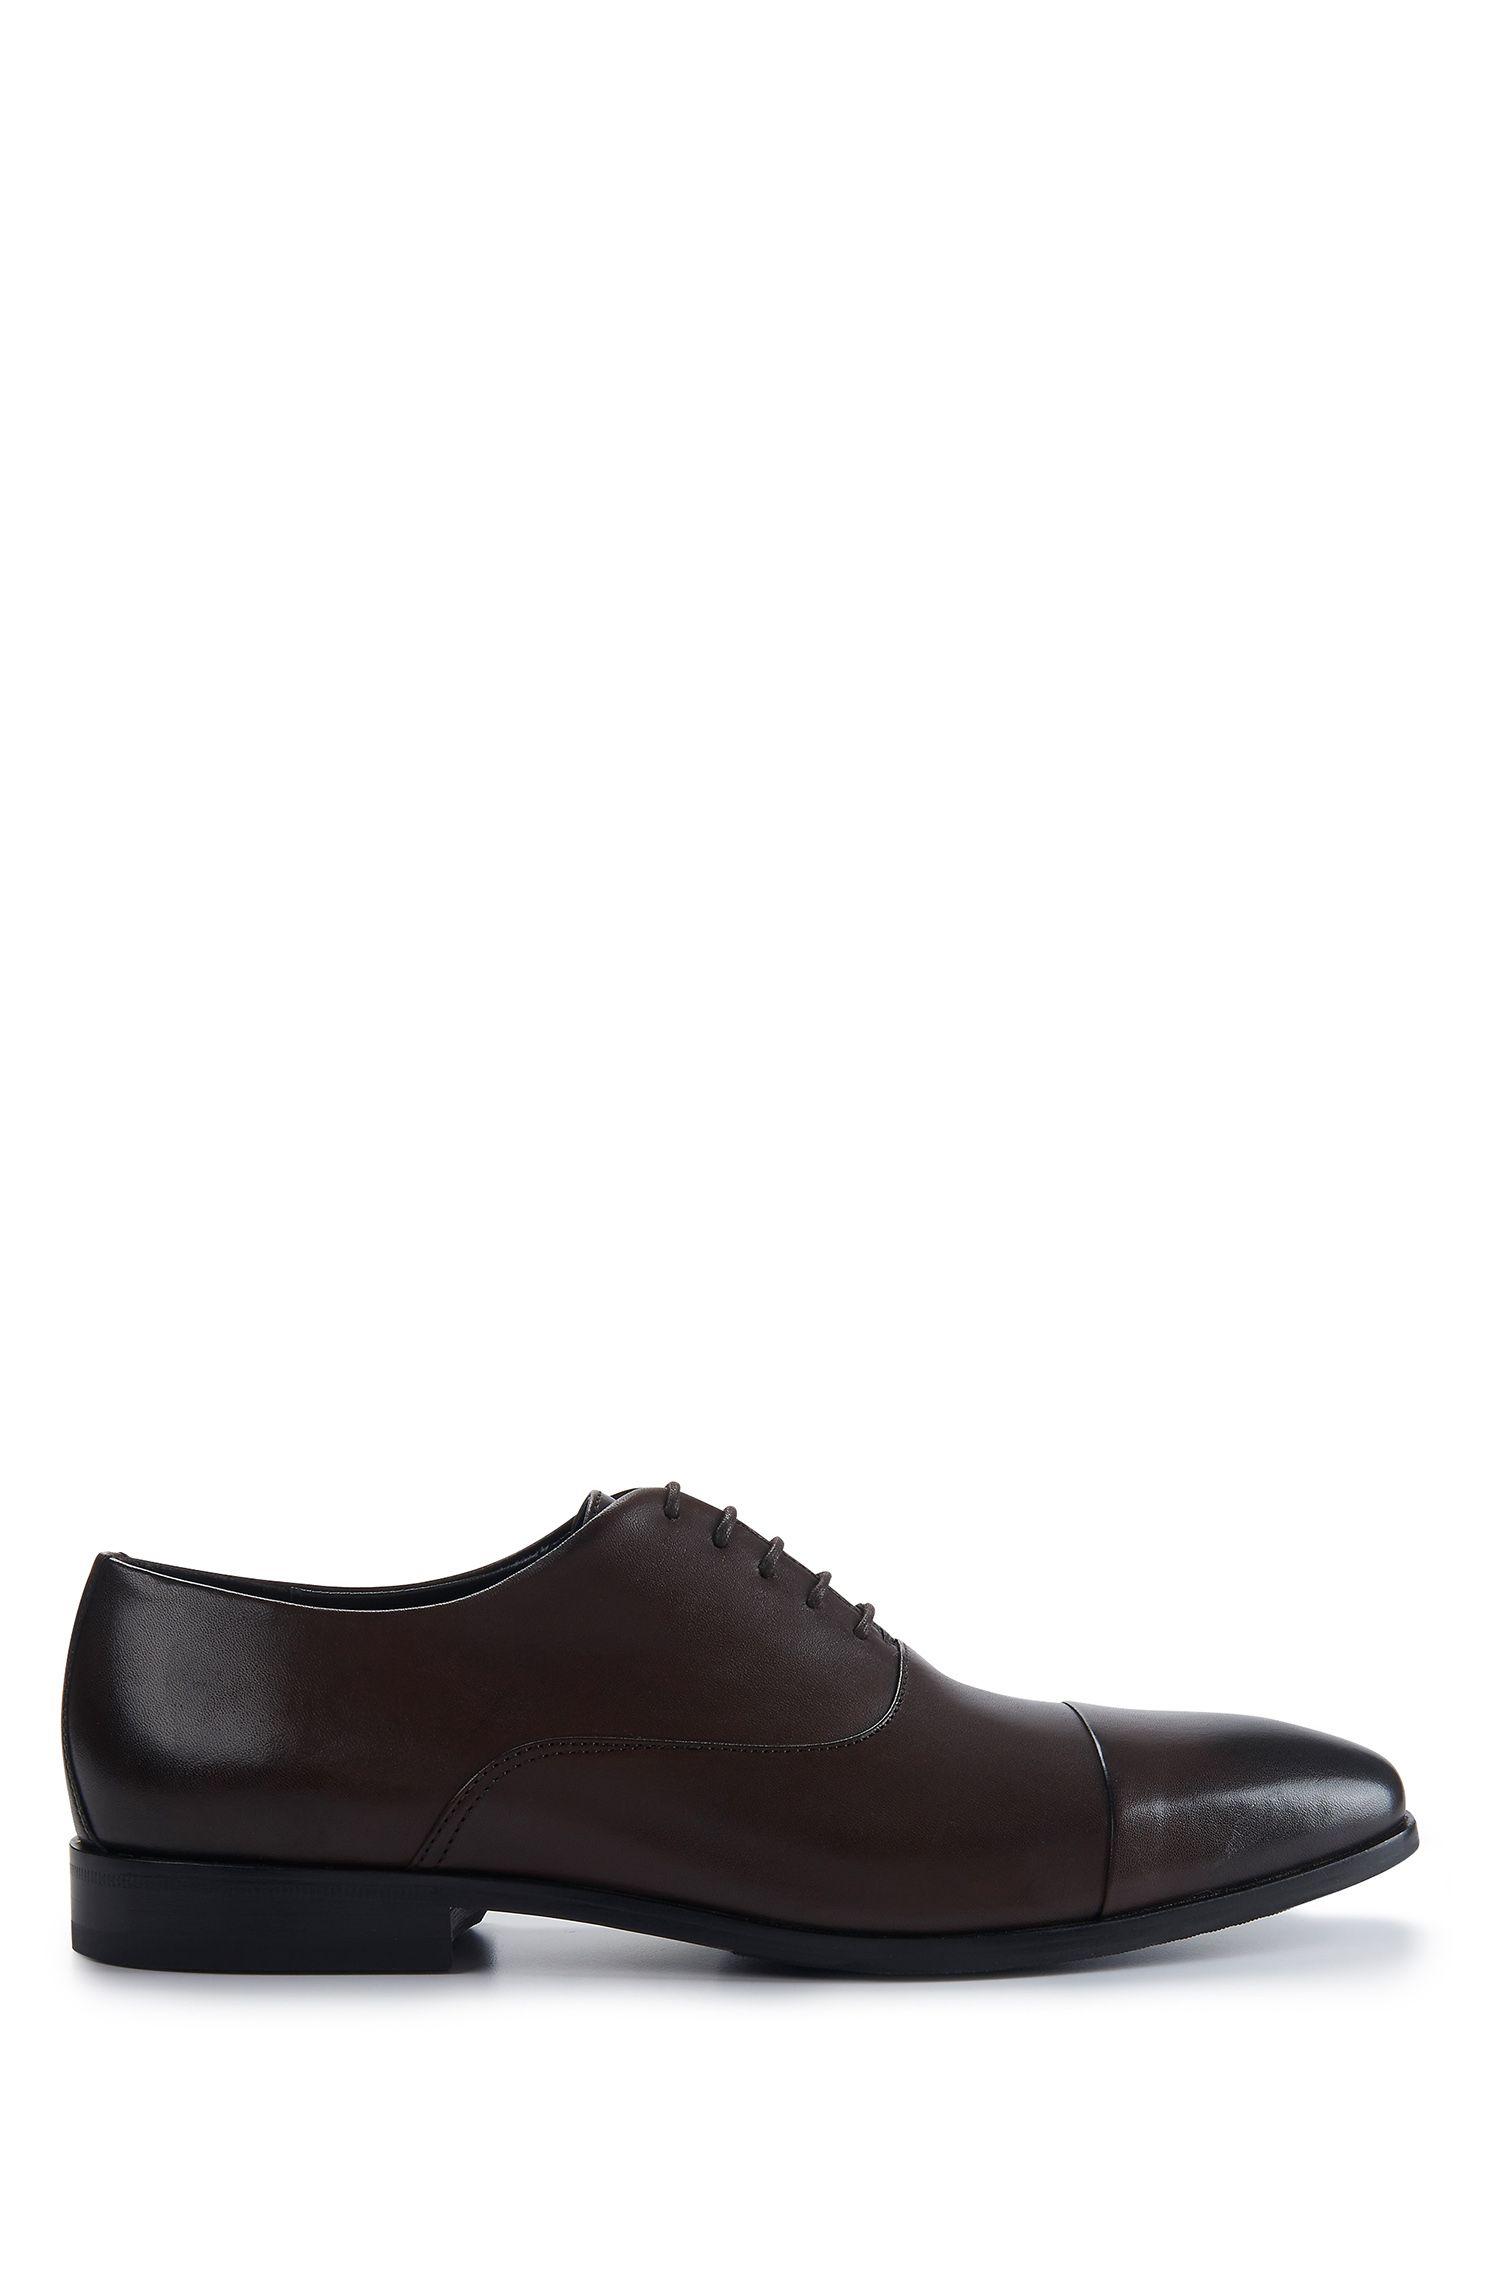 Leather Oxford Dress Shoe | Highline Oxfr Buct